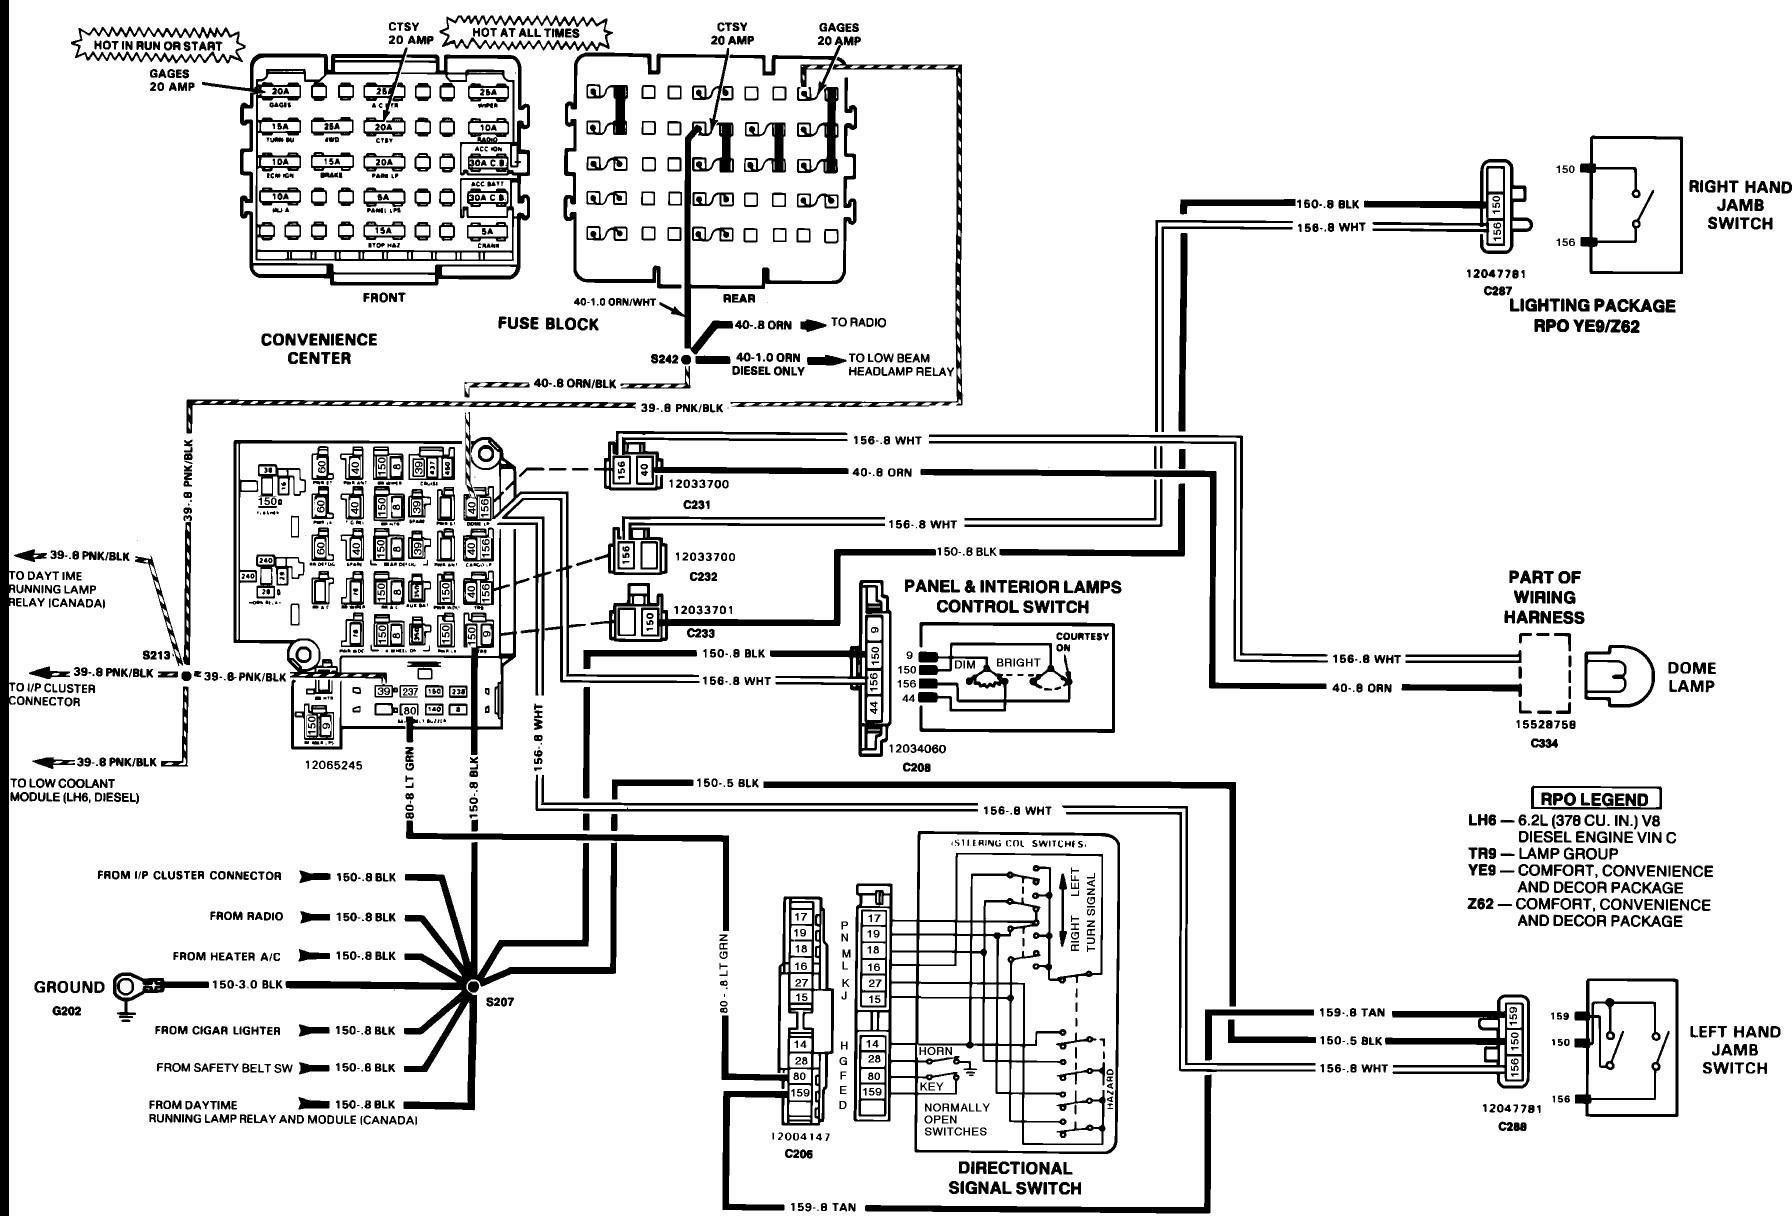 1991 chevy truck wiring diagram my wiring diagram rh detoxicrecenze com 1991 Chevy Suburban Wiring Diagram 1991 Chevy 1500 Wiring Diagram